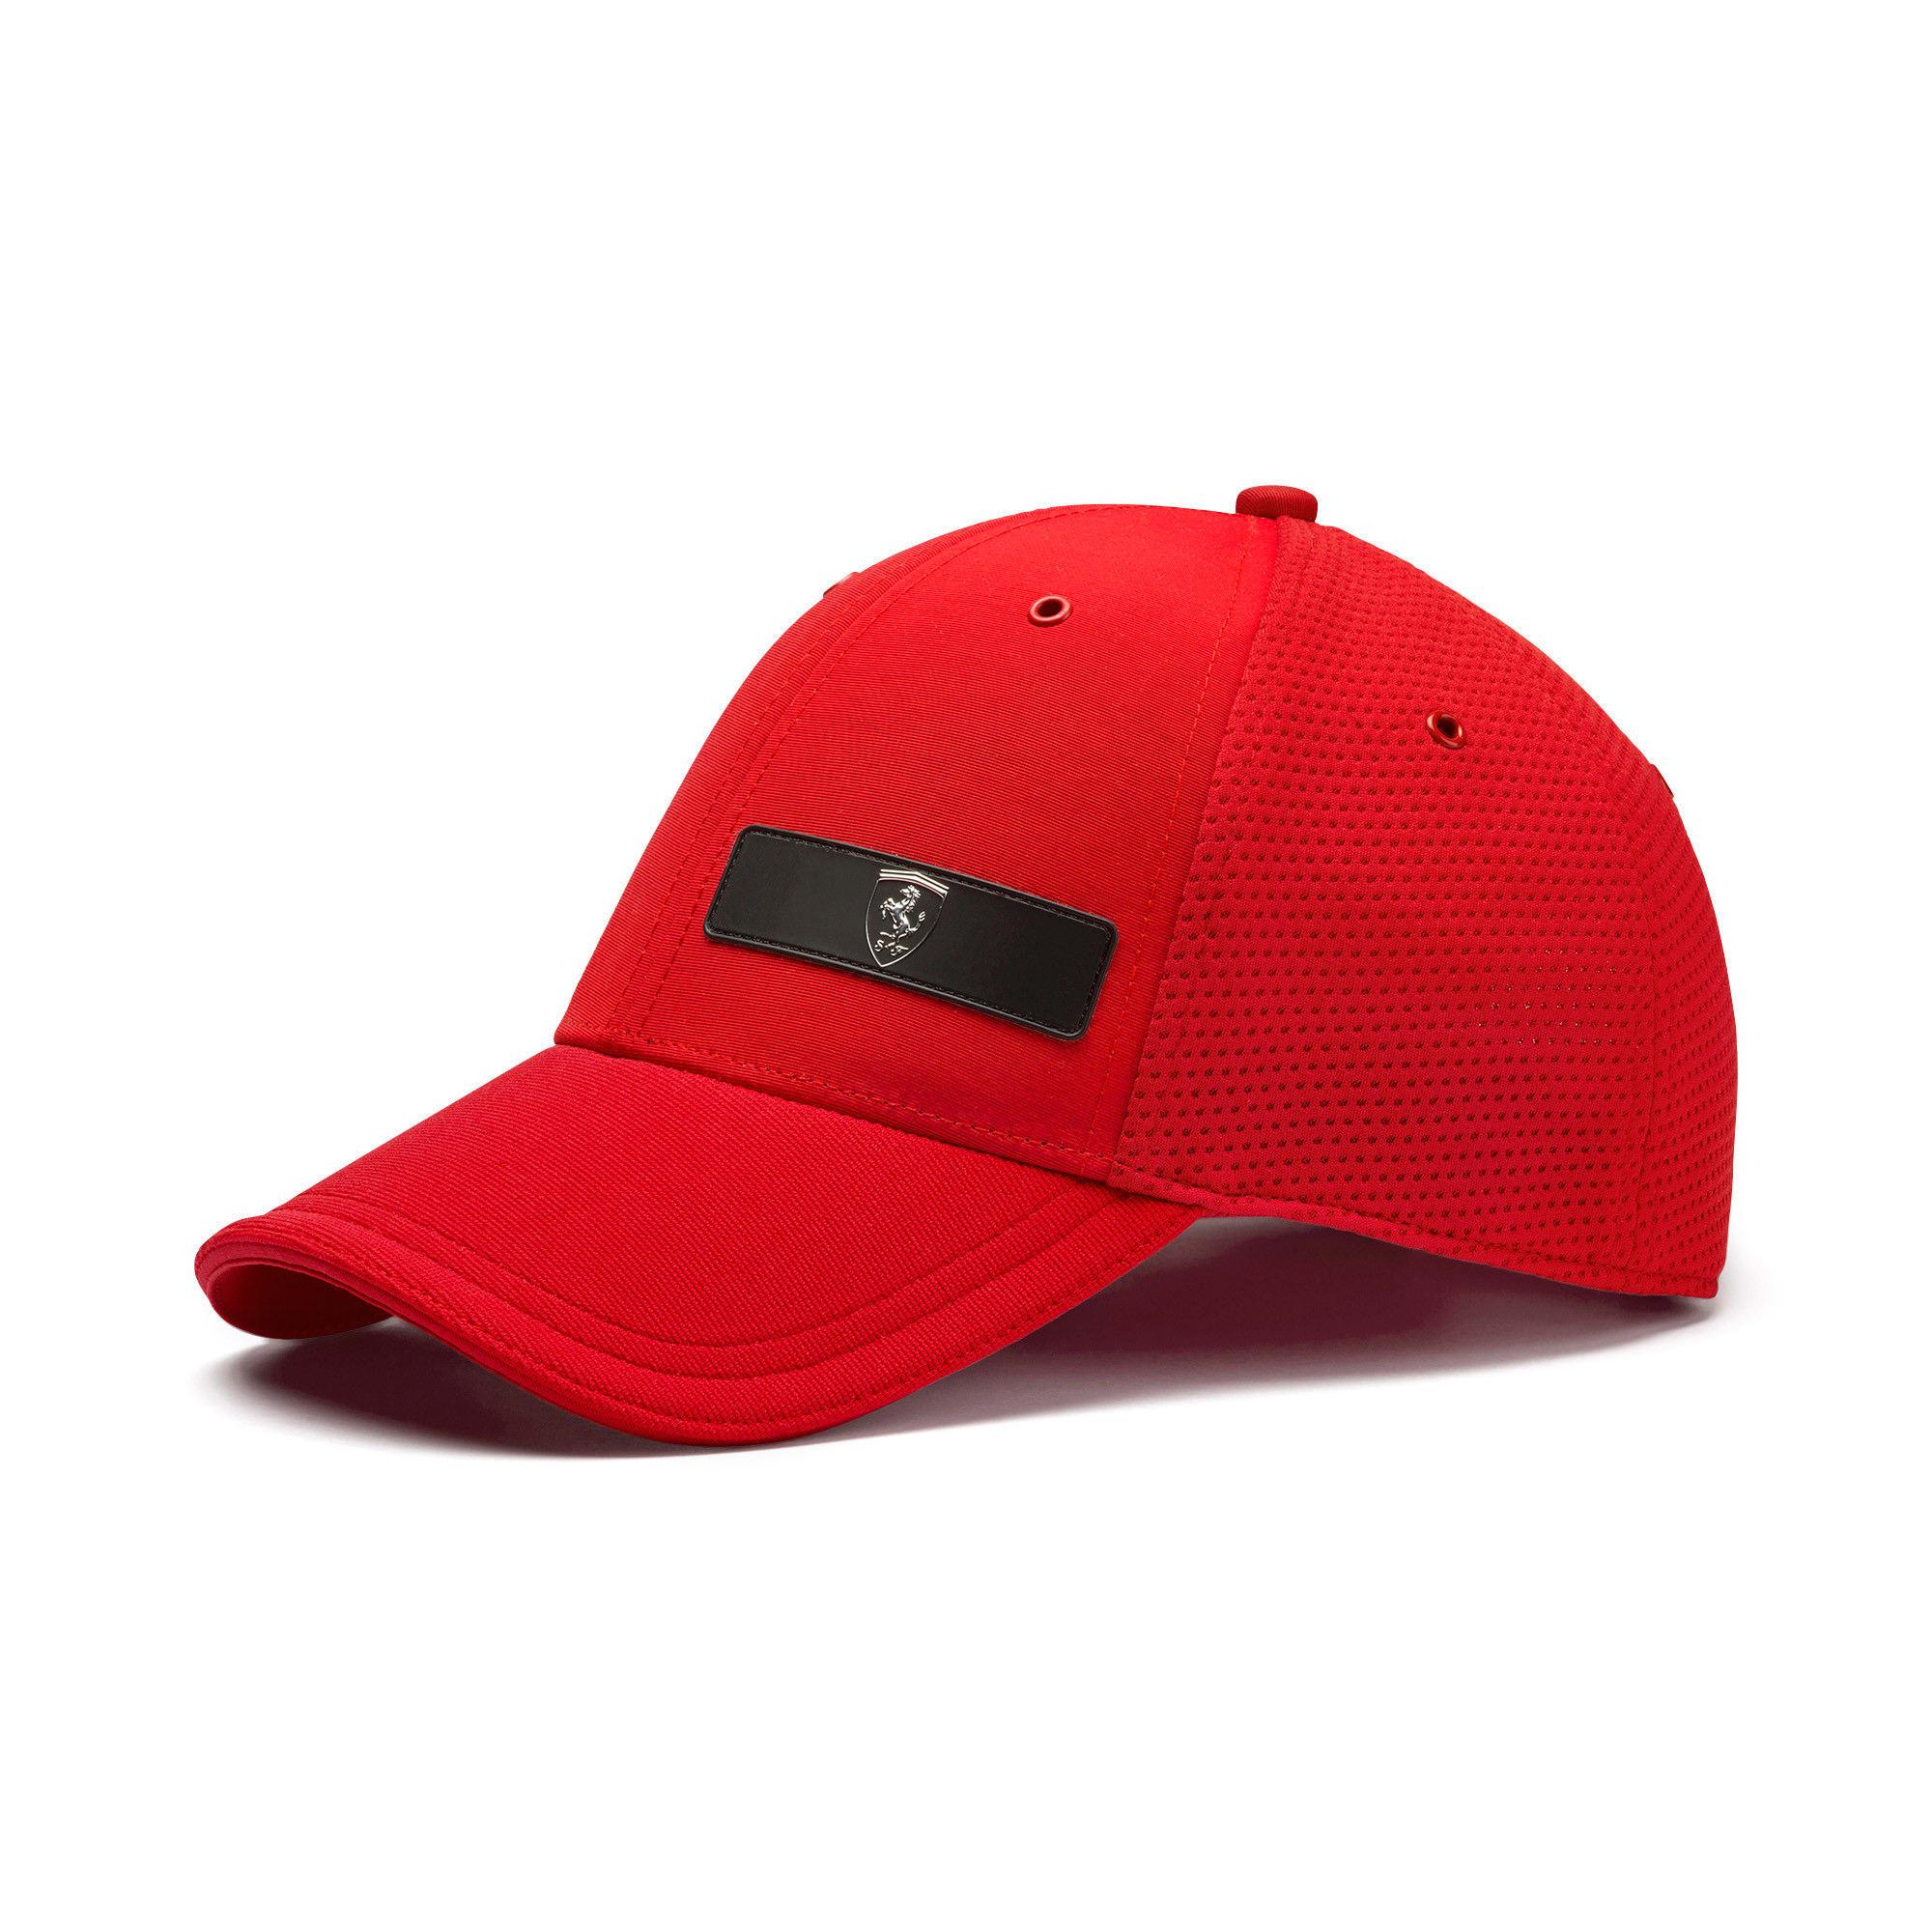 Thumbnail 1 of Scuderia Ferrari LS Baseball Cap, Rosso Corsa, medium